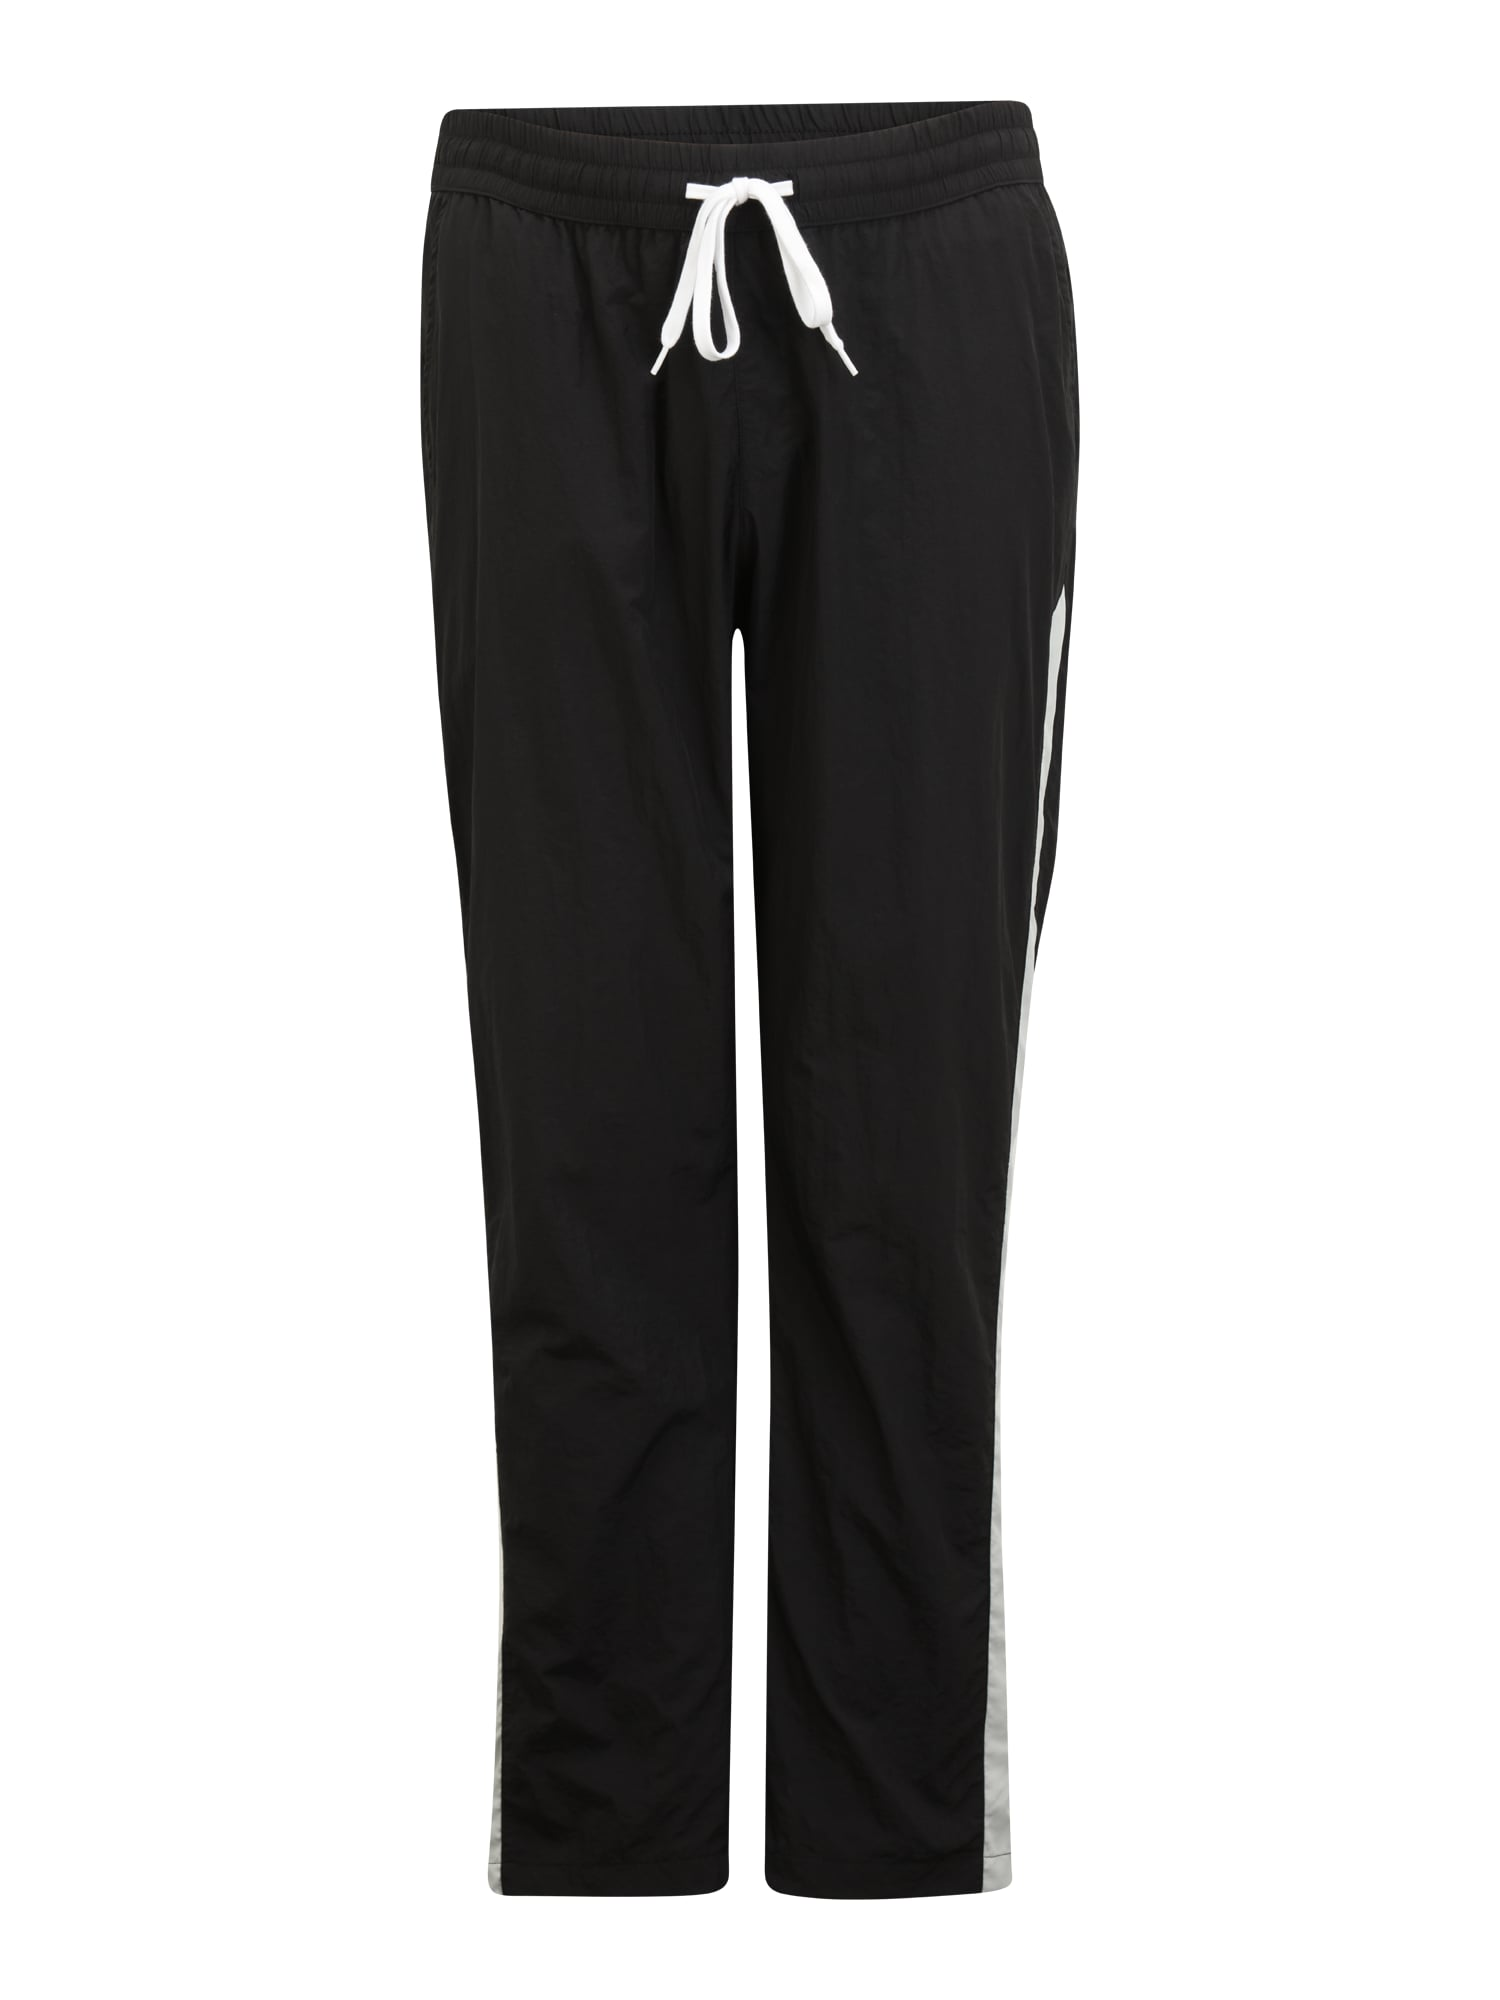 Urban Classics Plus Size Kelnės juoda / balta